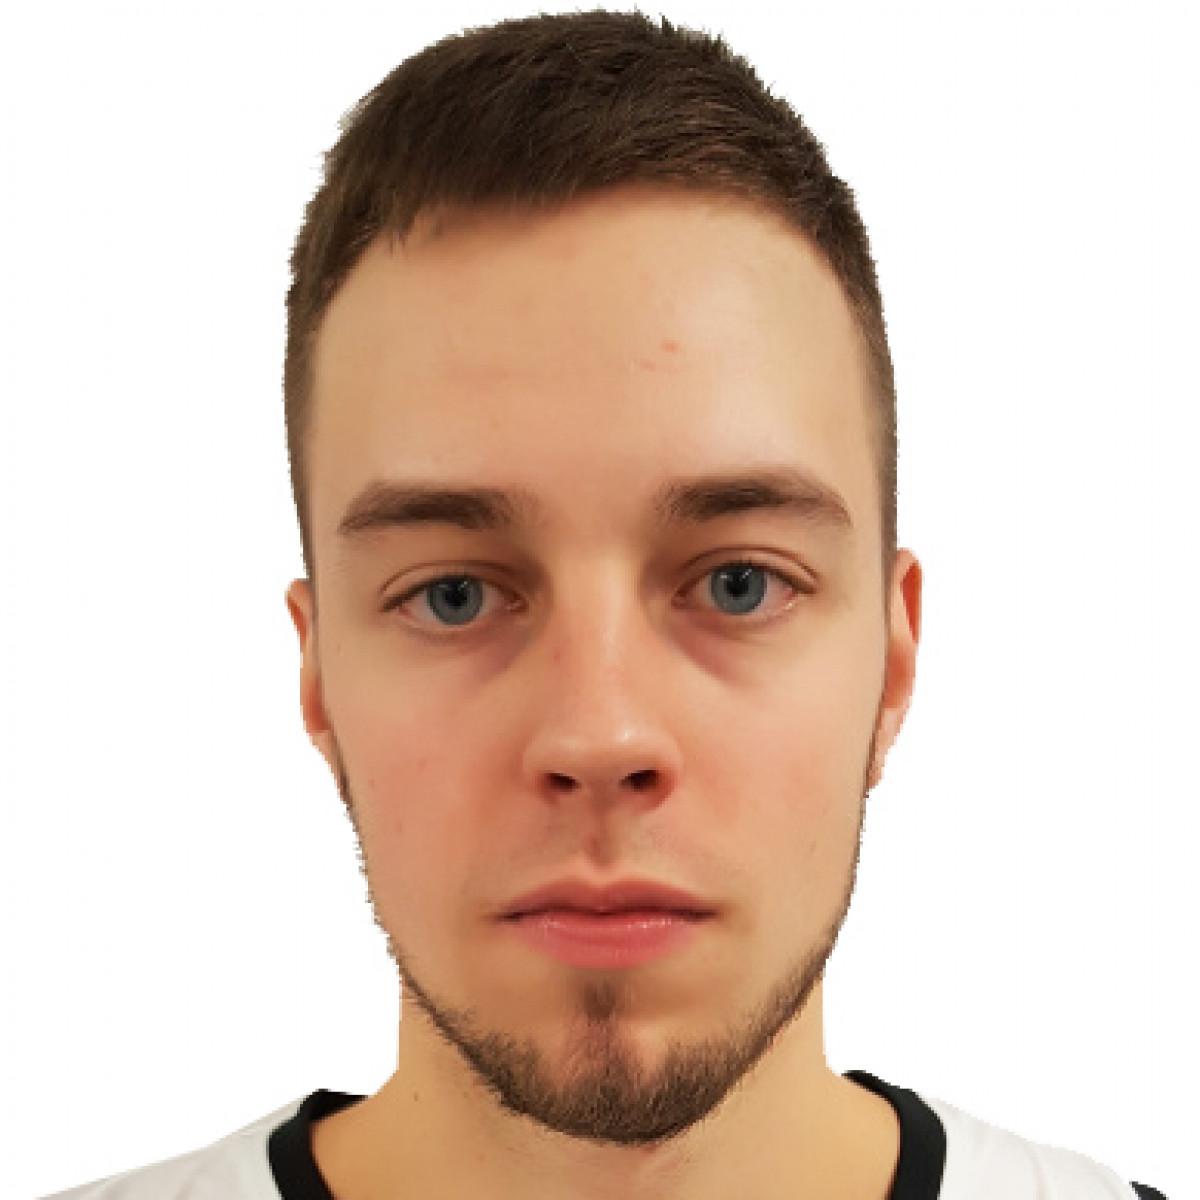 Vytautas Jakubaitis